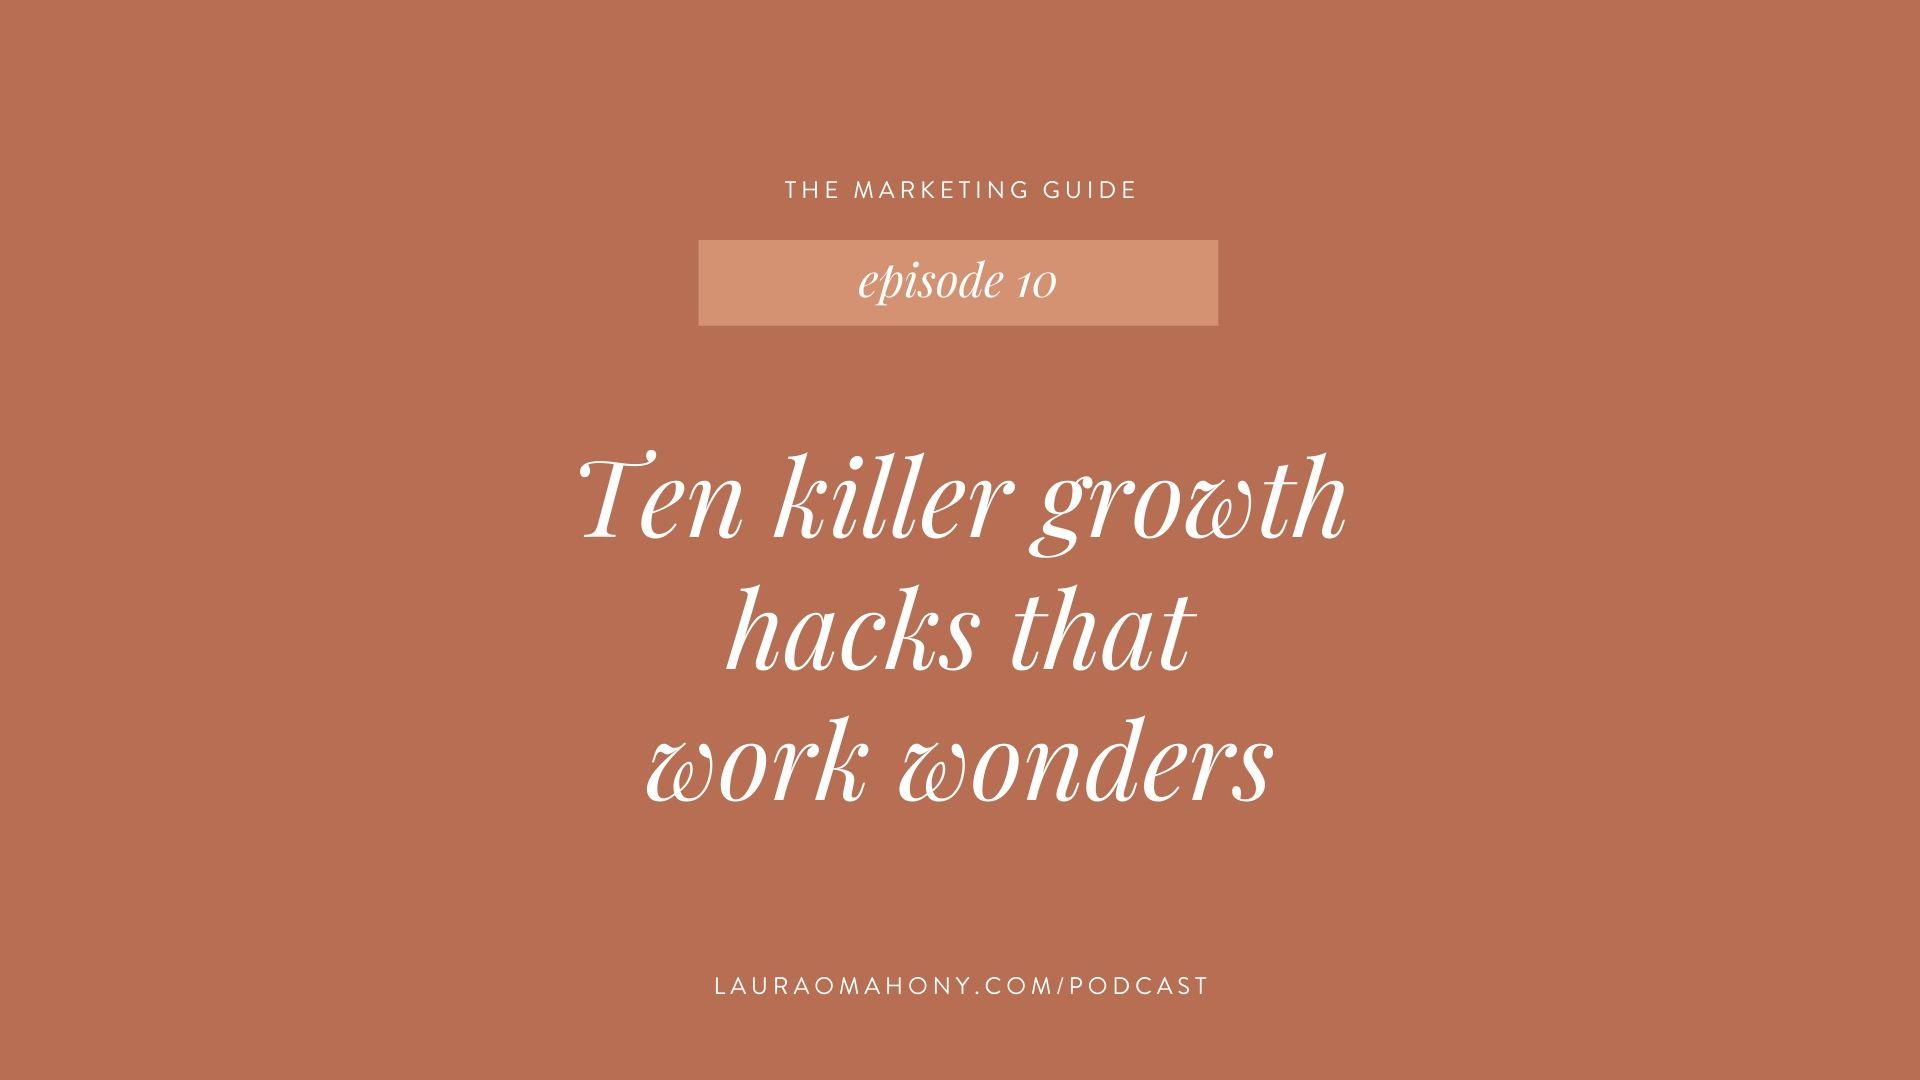 The Marketing Guide - Ten killer growth hacks that work wonders